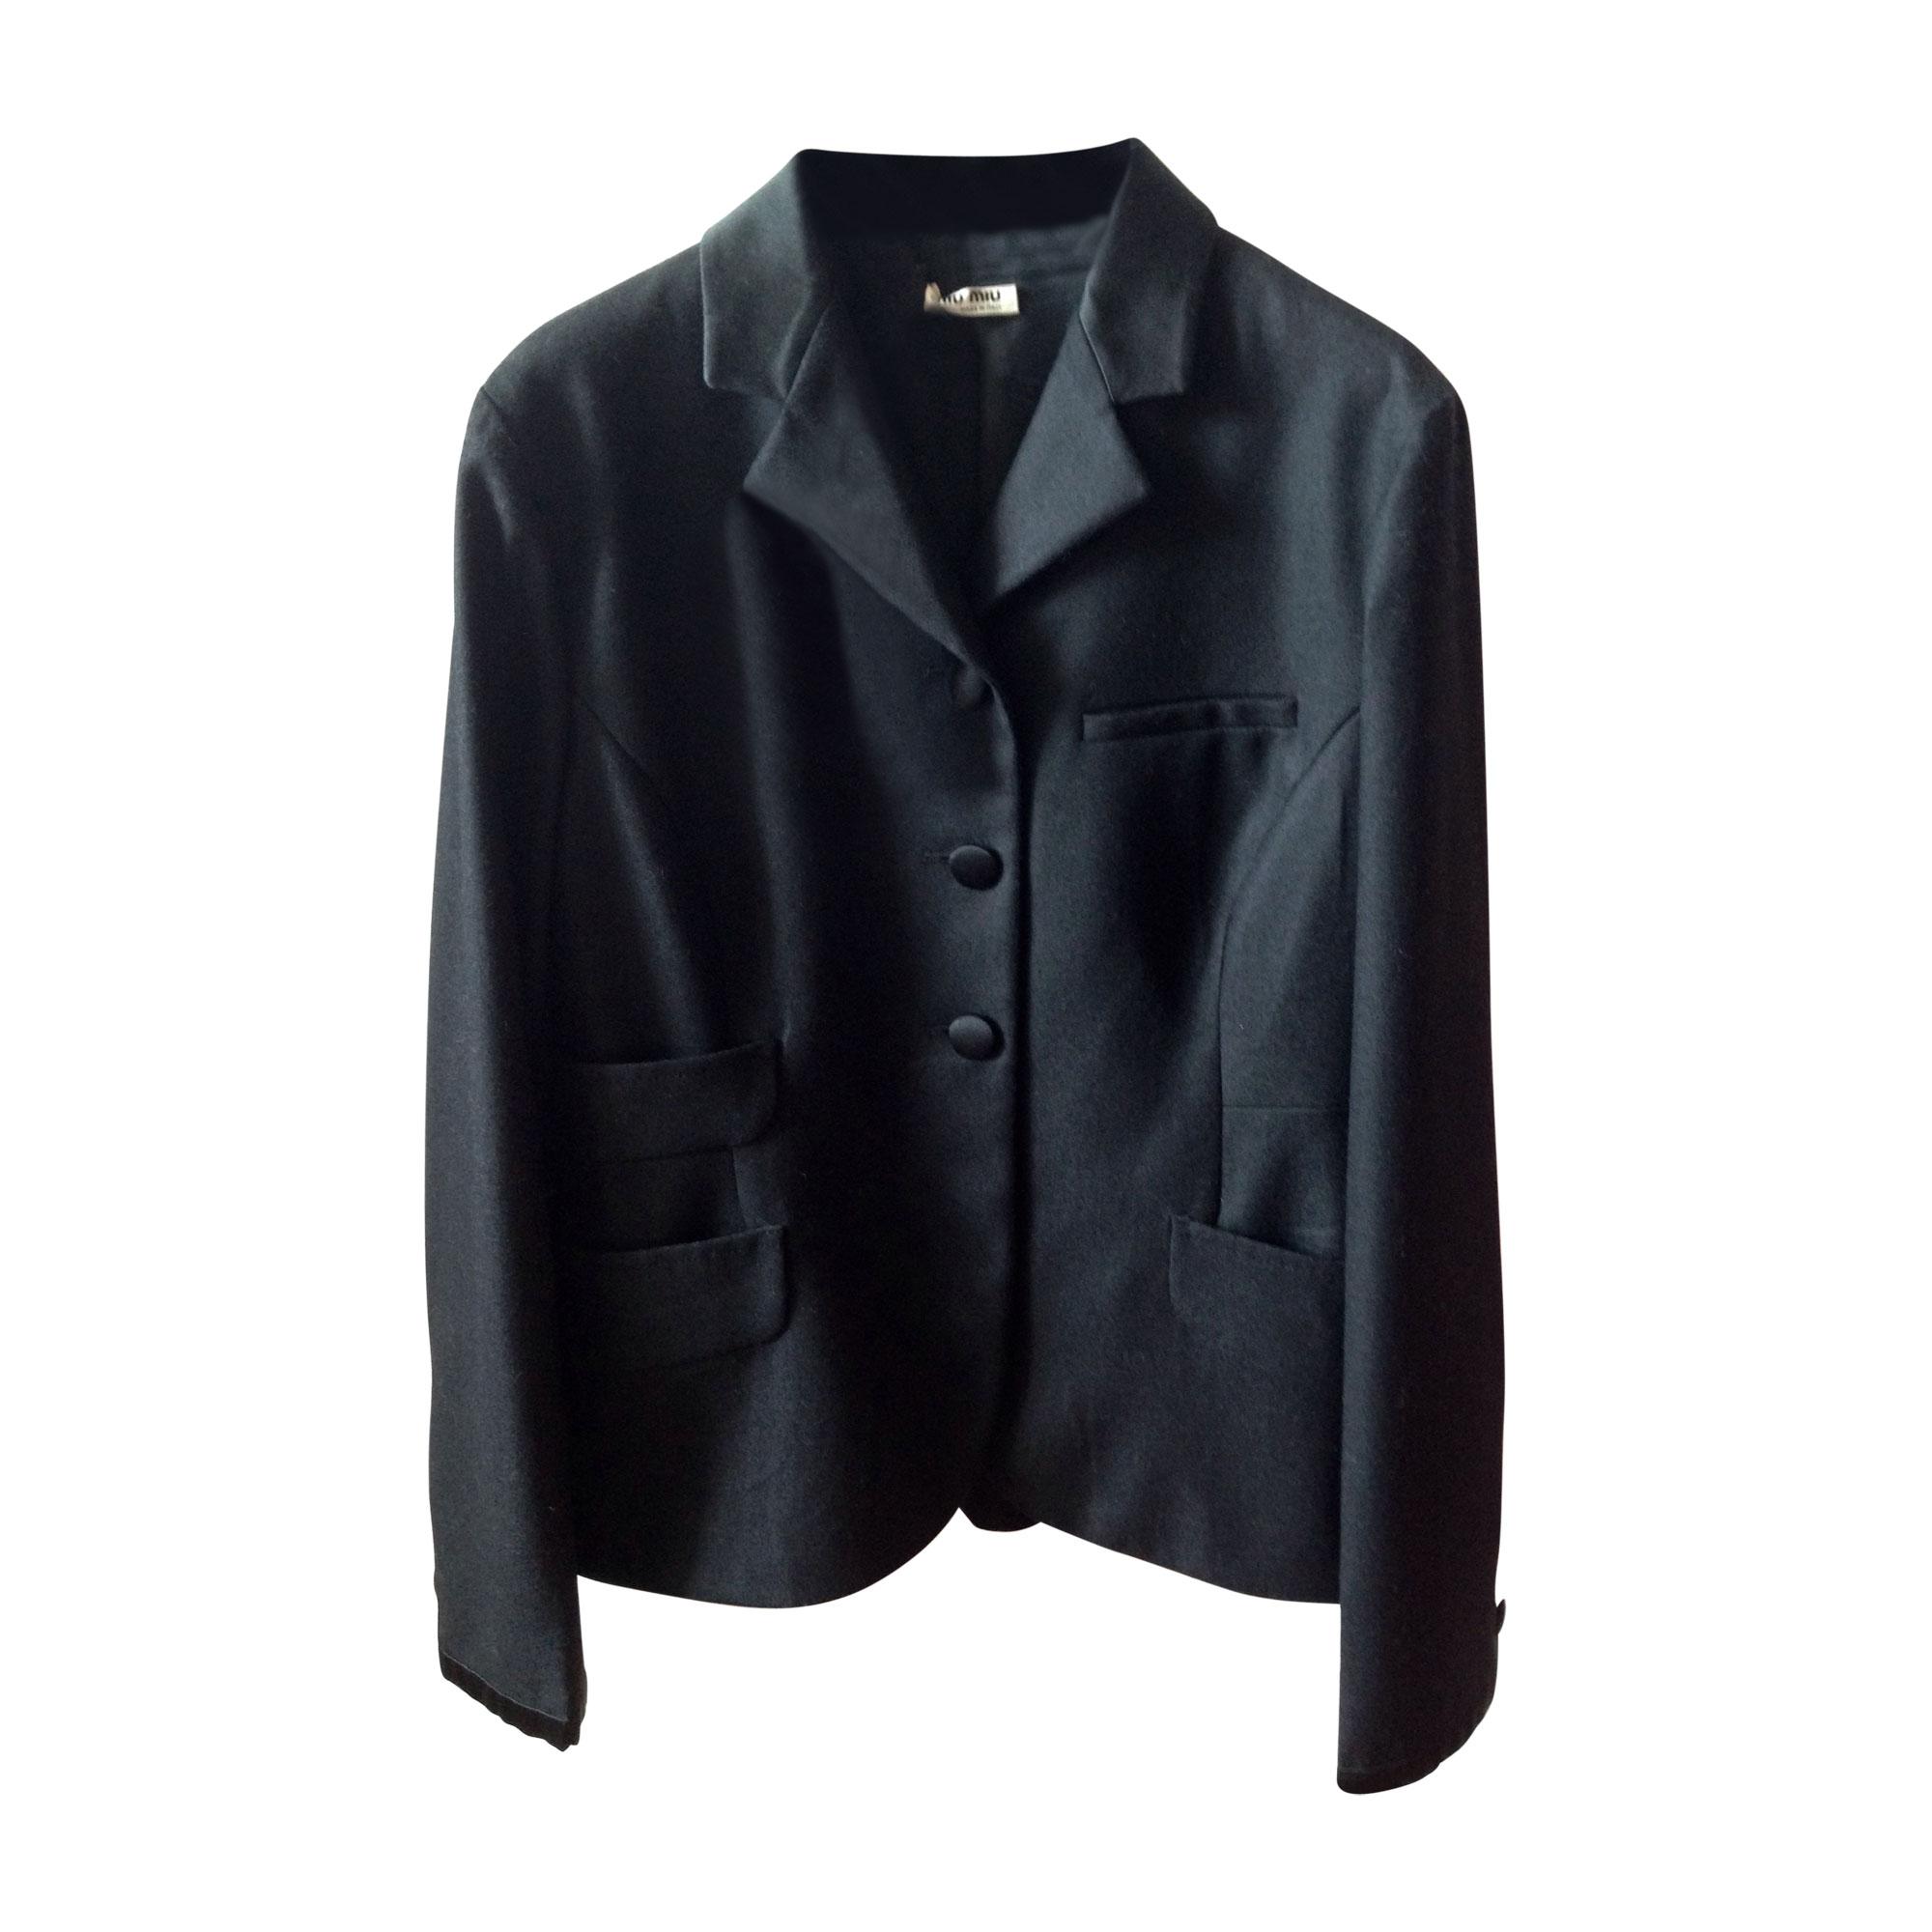 Blazer, veste tailleur MIU MIU Noir